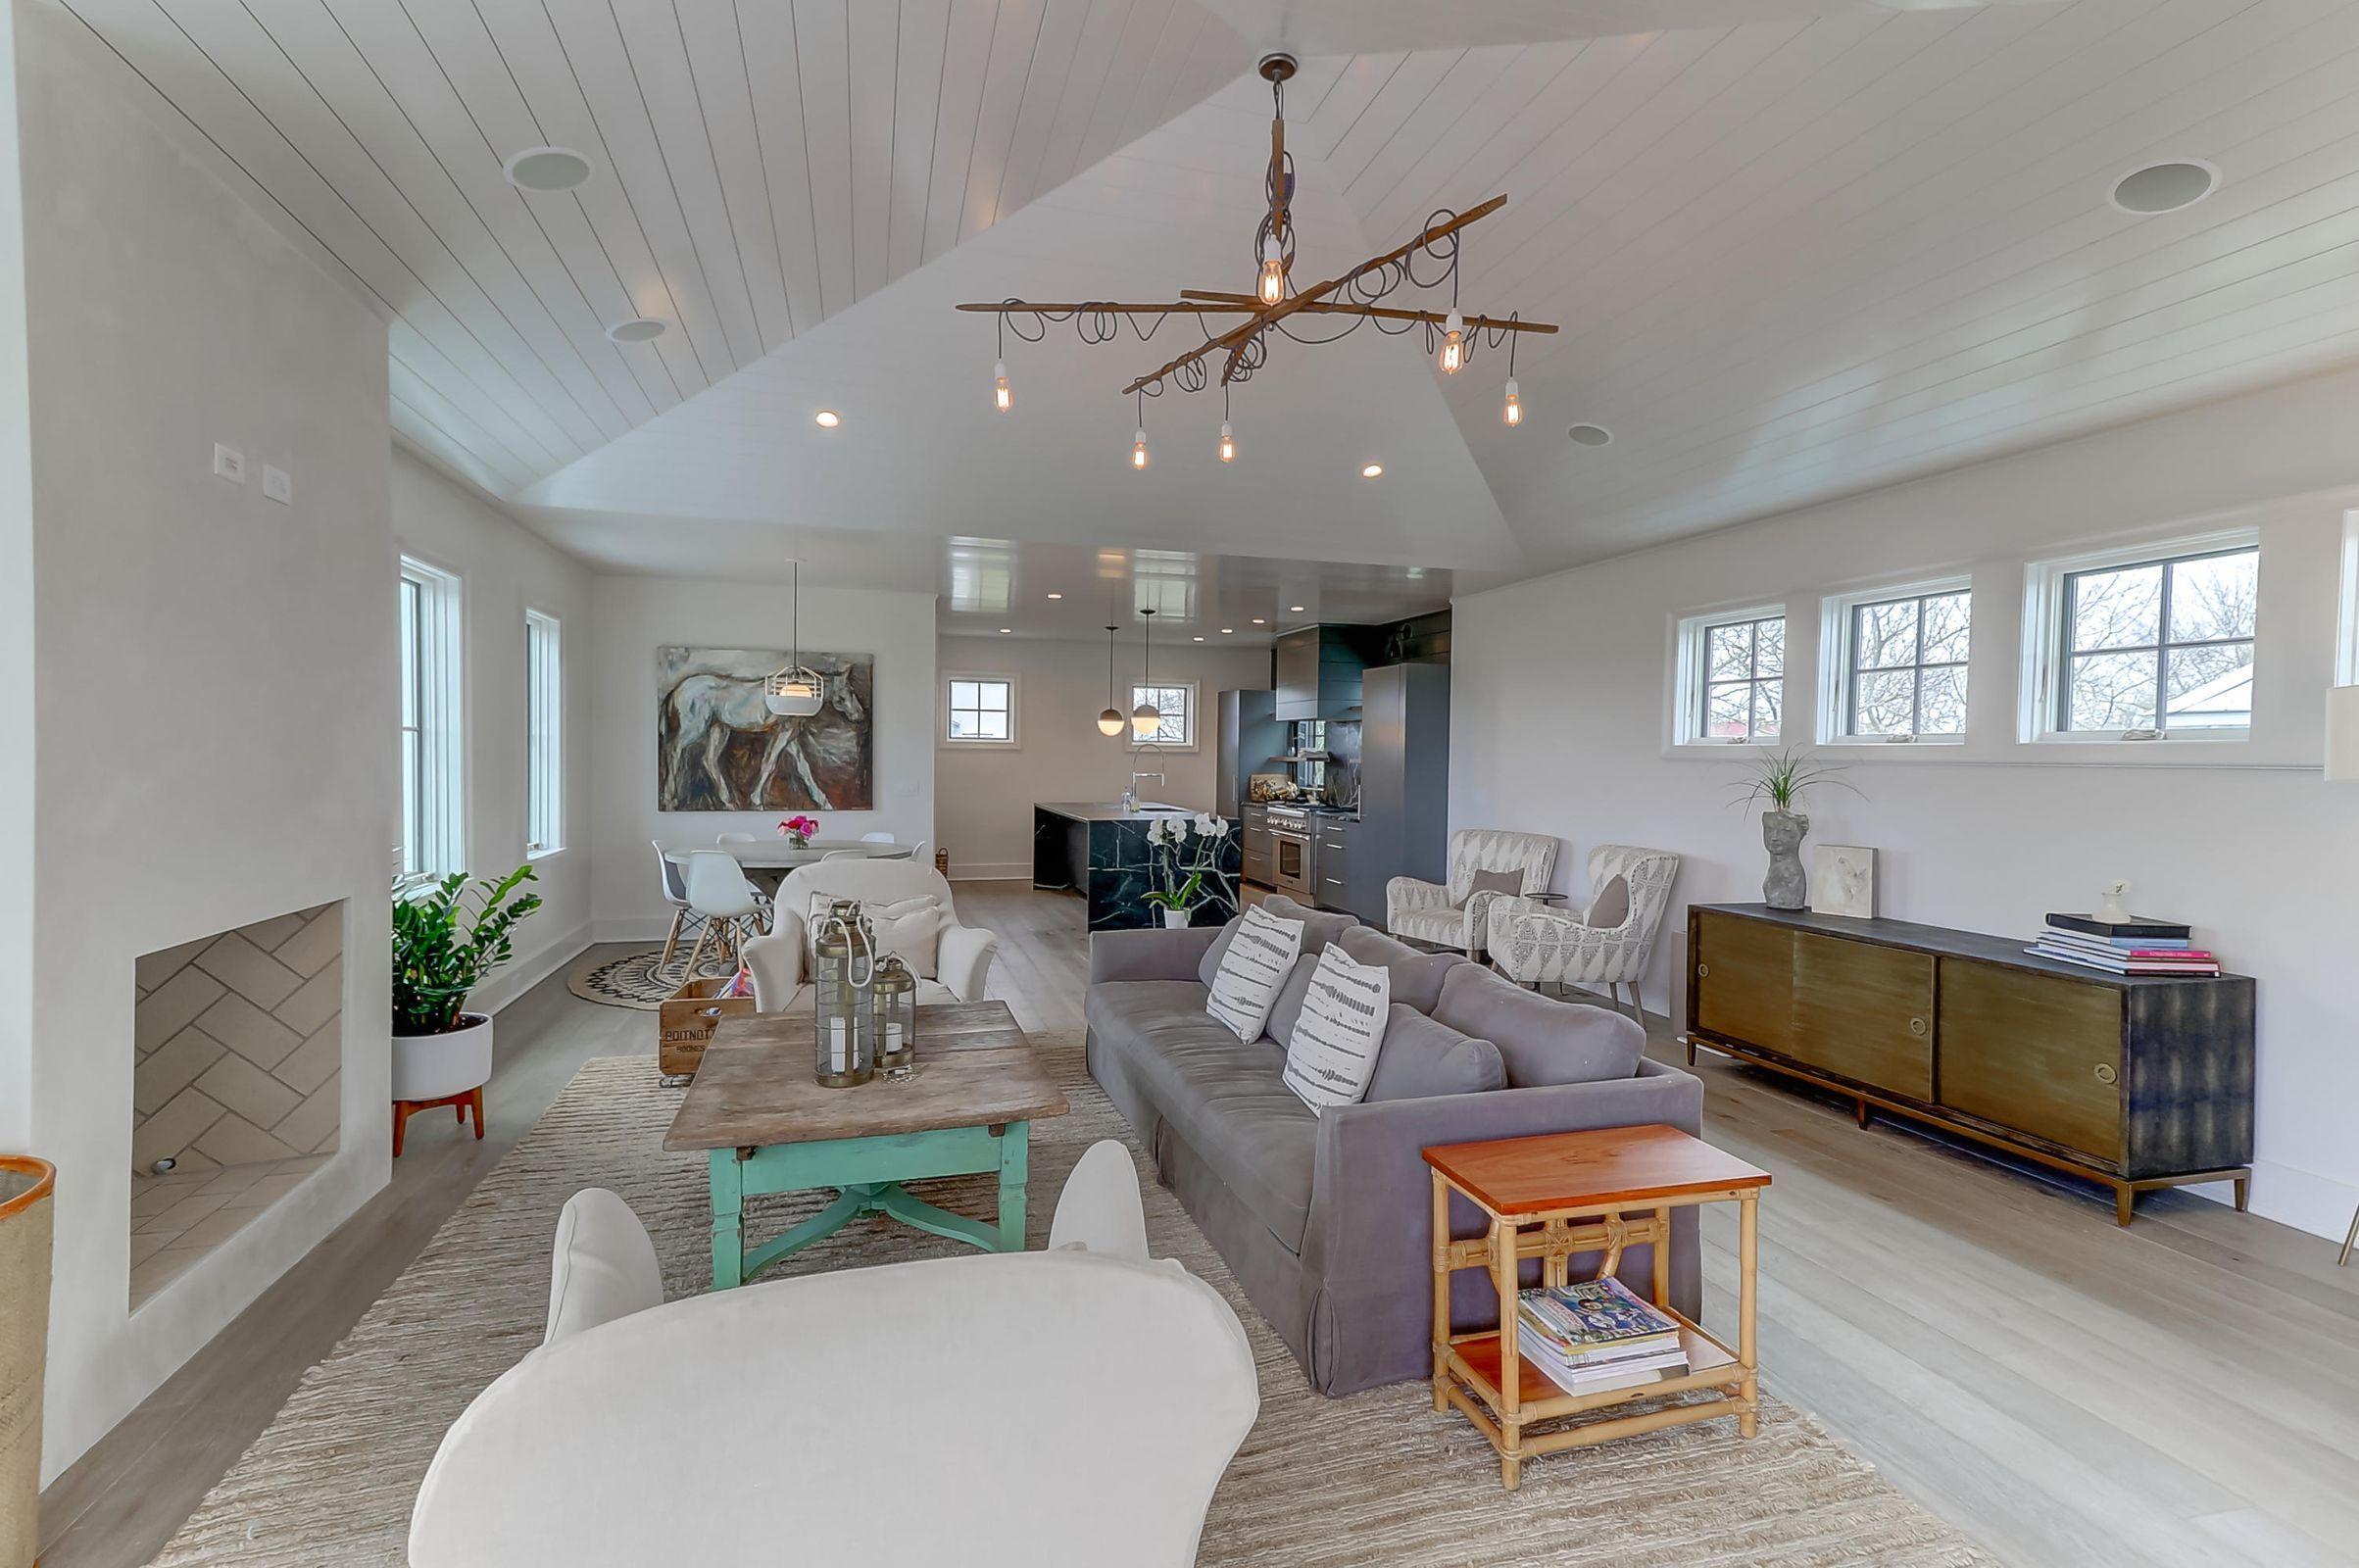 Sullivans Island Homes For Sale - 918 Middle, Sullivans Island, SC - 35